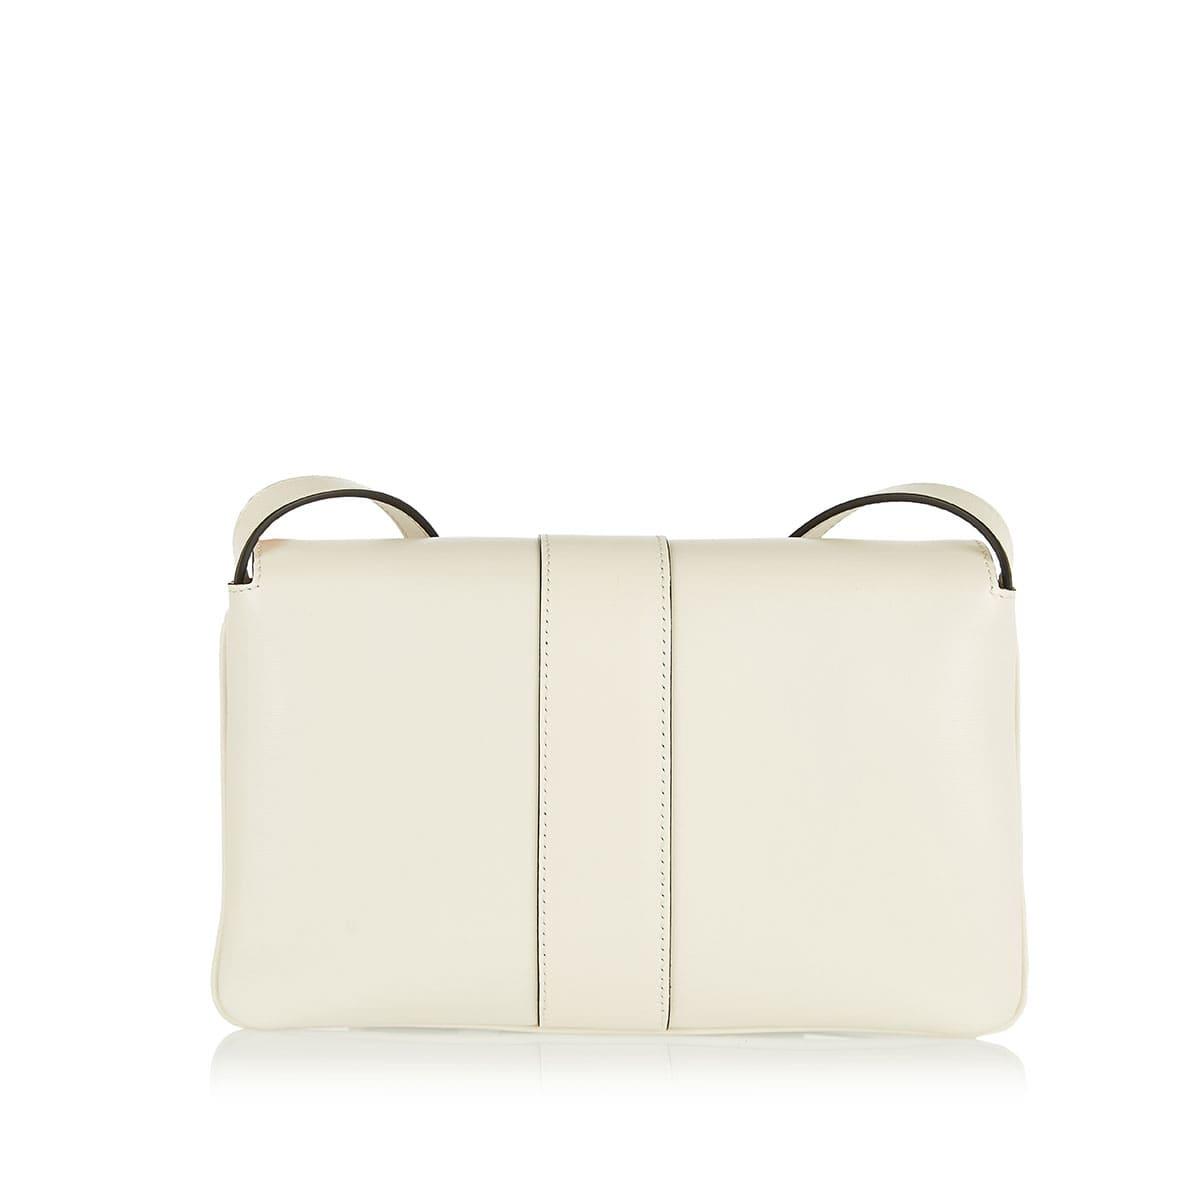 Arli small shoulder bag